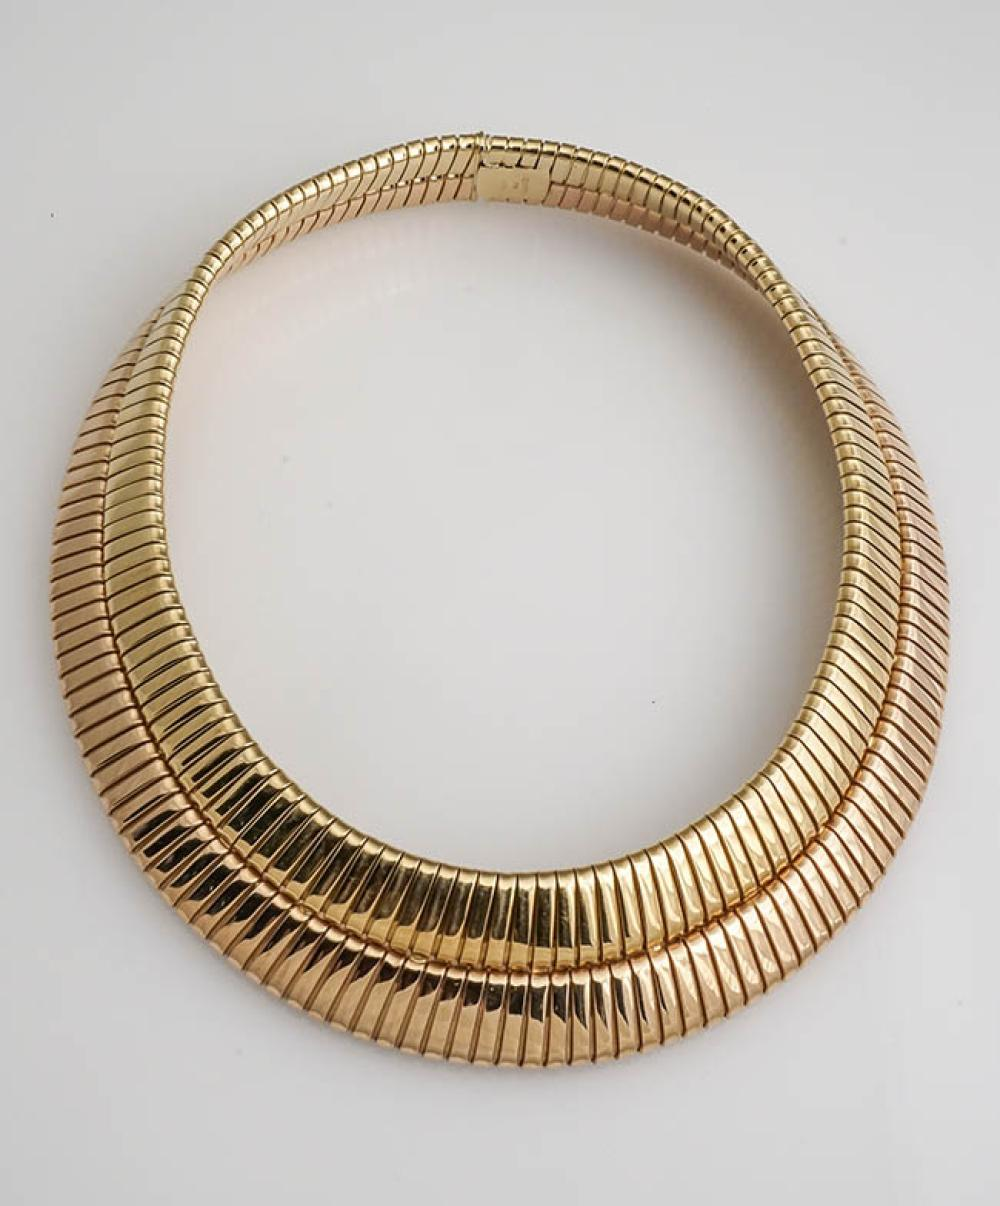 Italian Princess Length 18-Karat Yellow-Gold and Rose-Gold 'Double Tubogas' Necklace, Bulgari